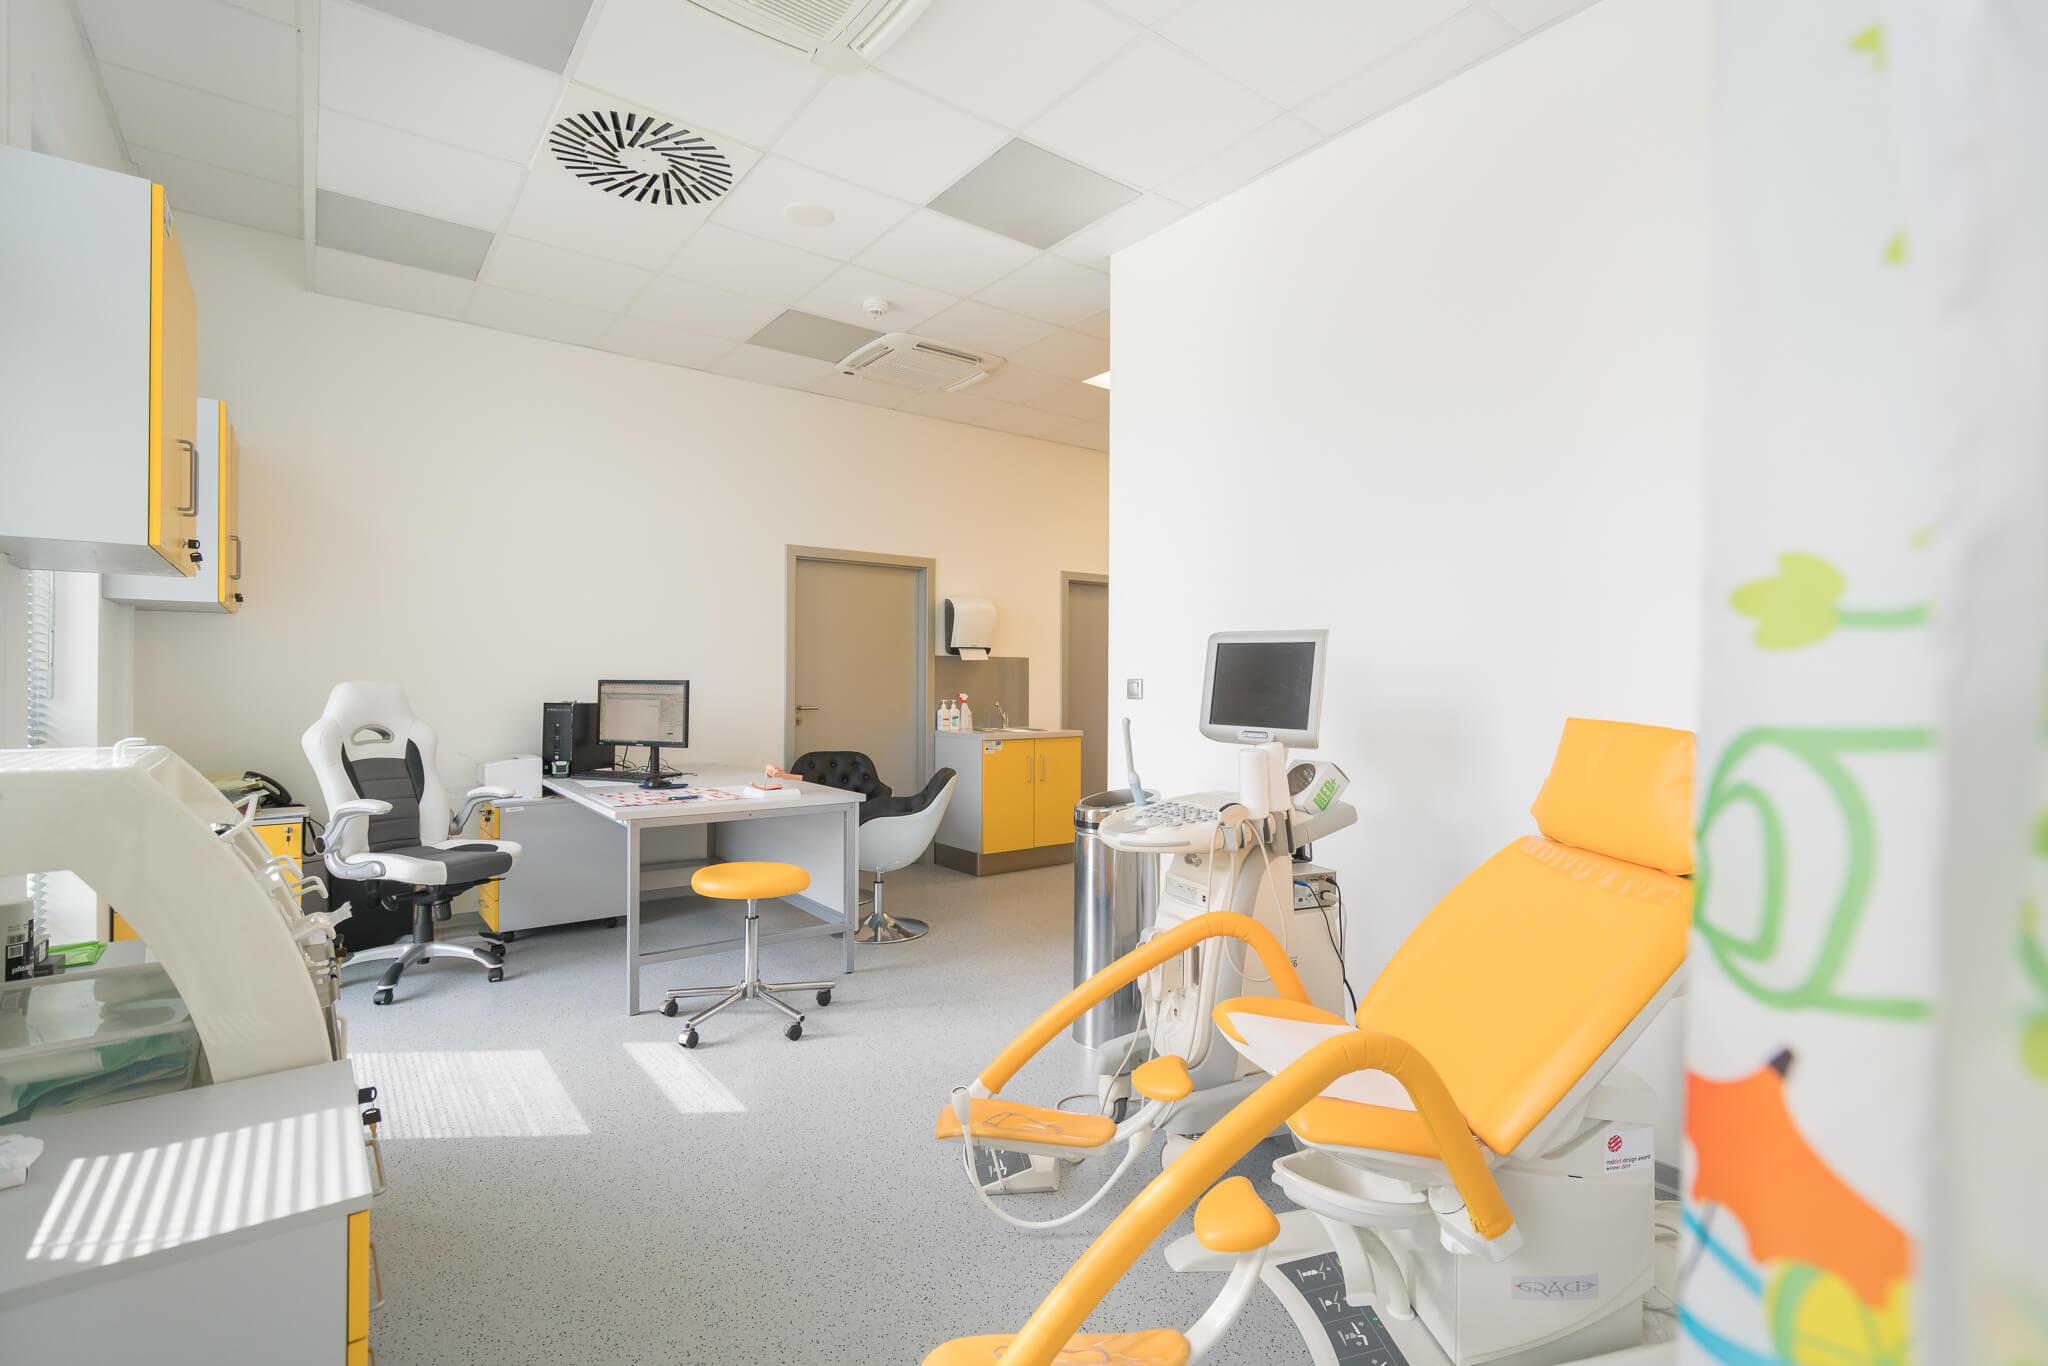 Ostrava-i klinika